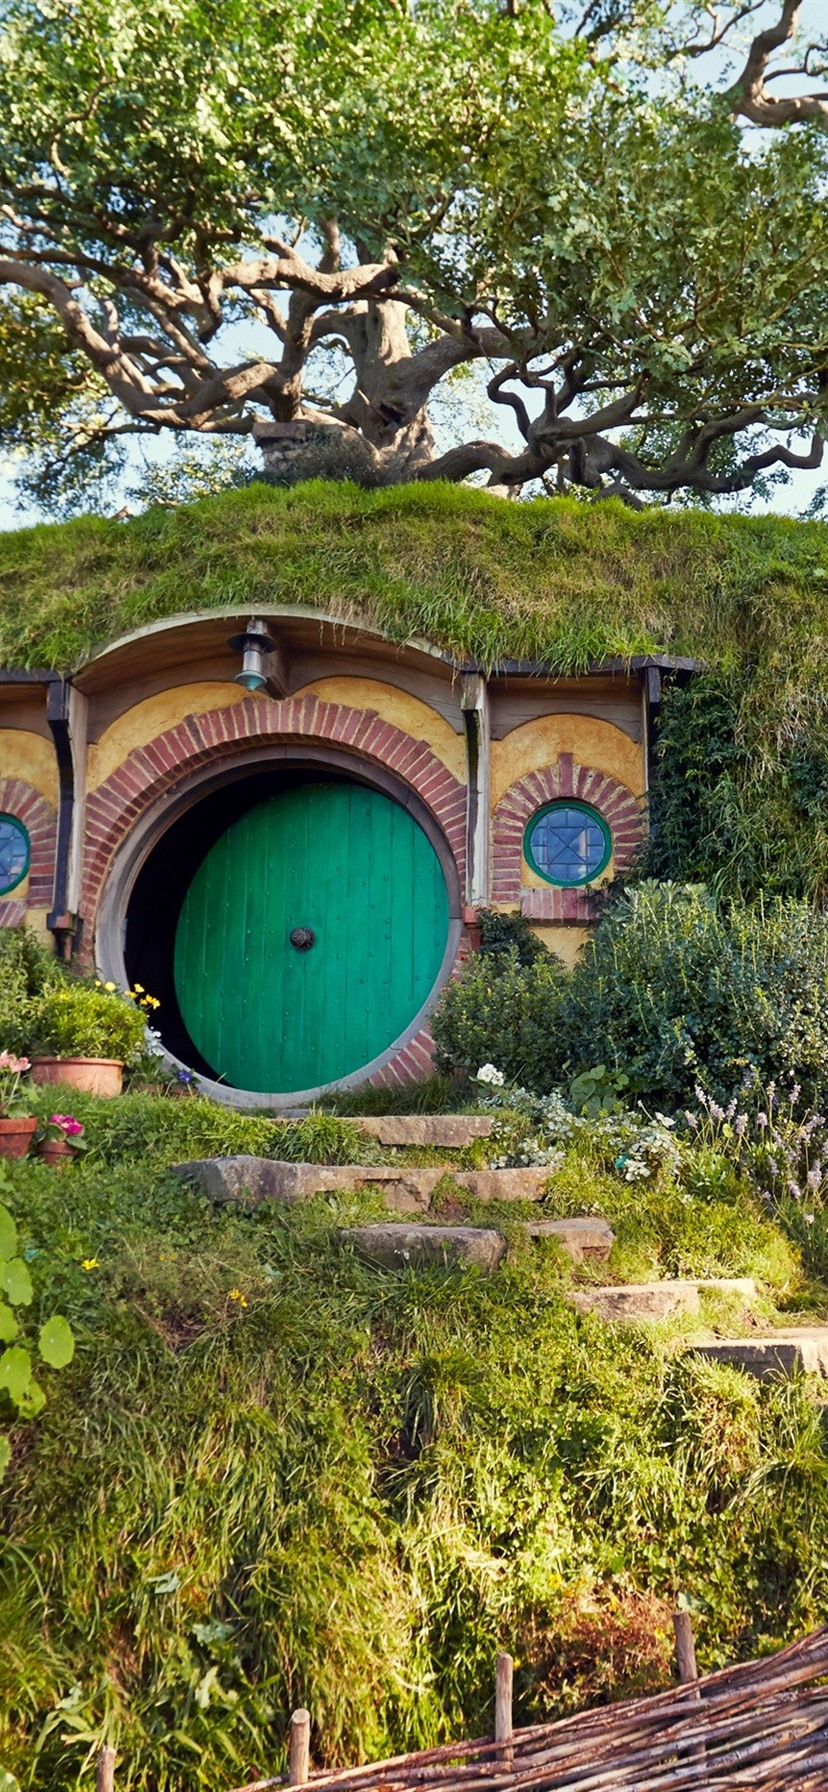 Iphone Wallpaper Hobbit House - New Zealand Northern - HD Wallpaper